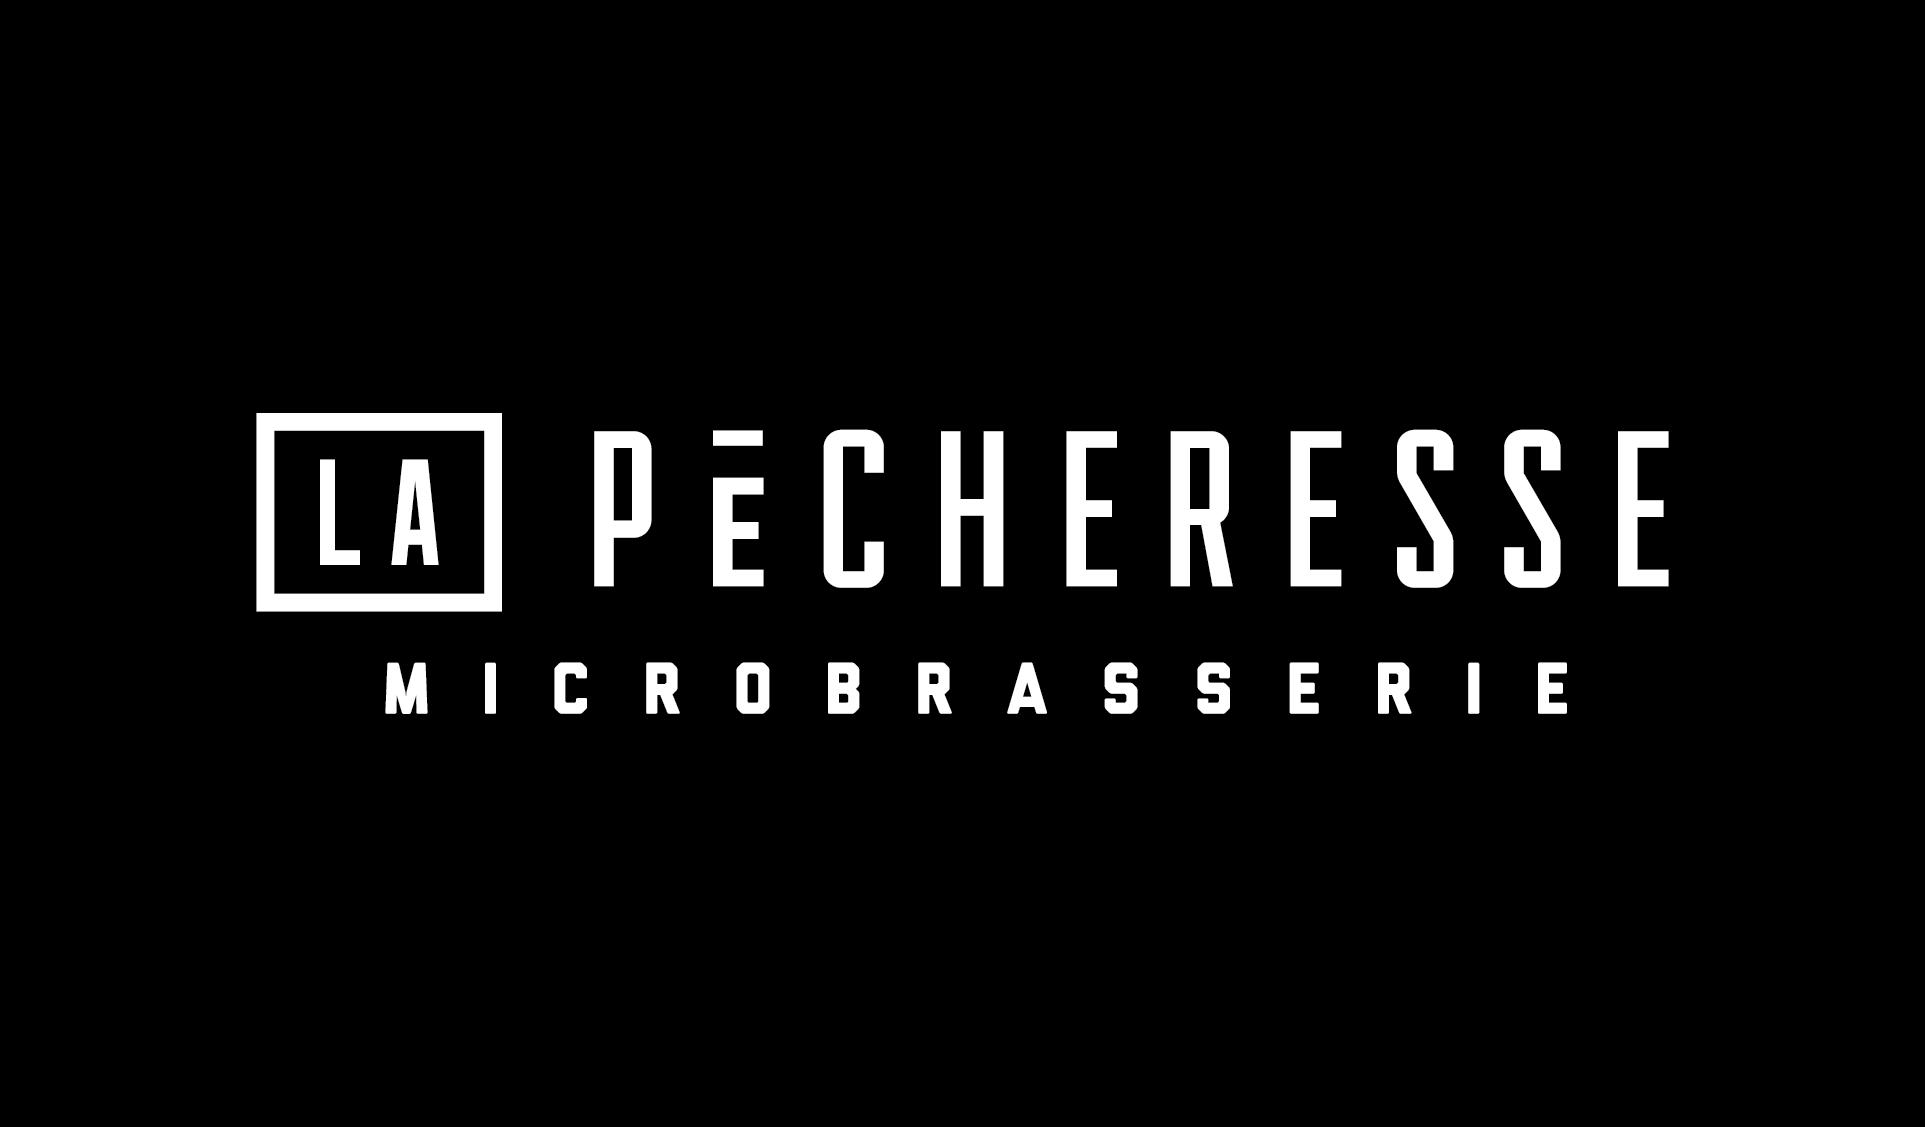 Microbrasserie La Pécheresse